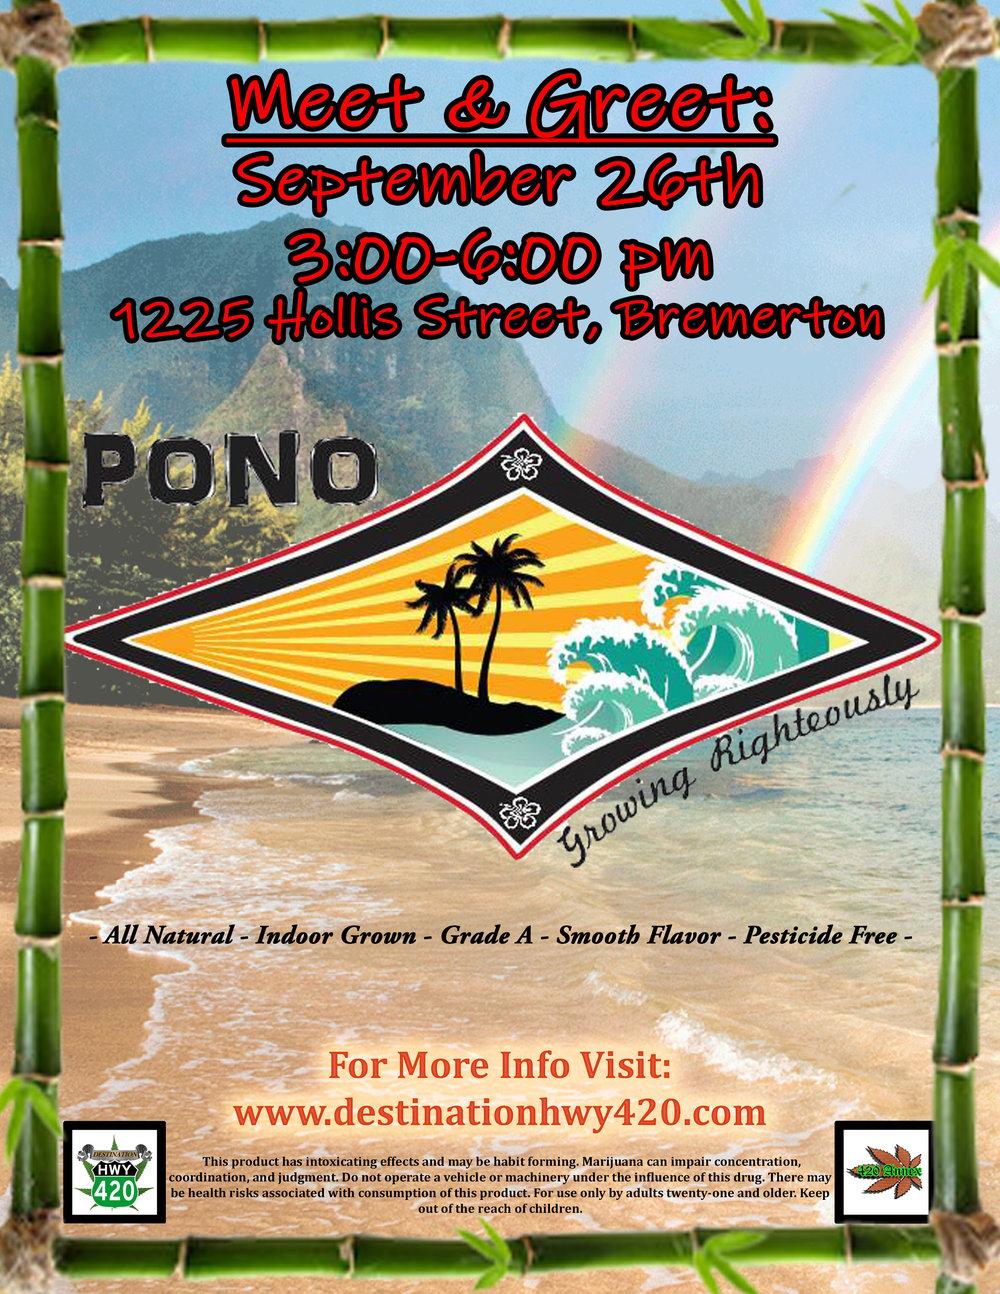 Pono-Meet-&-Greet-092618.jpg